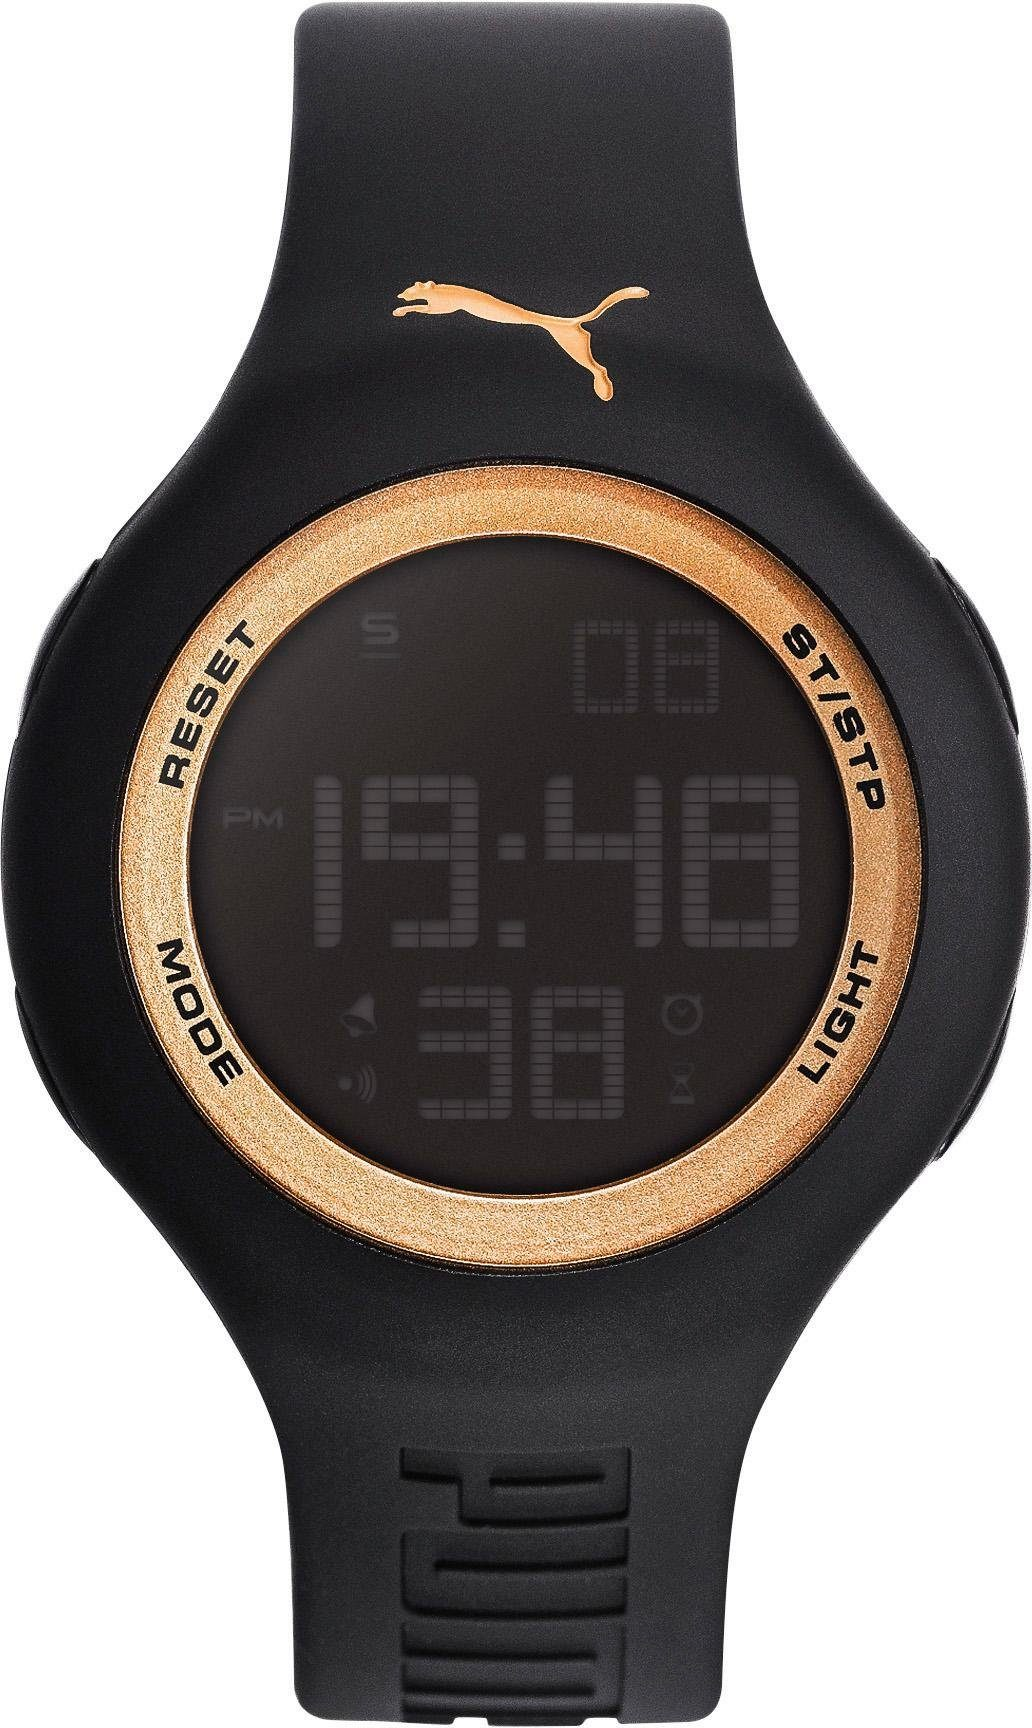 PUMA Chronograph »PU91080 PUMA Loop One 44 - Black gold, PU910801044«